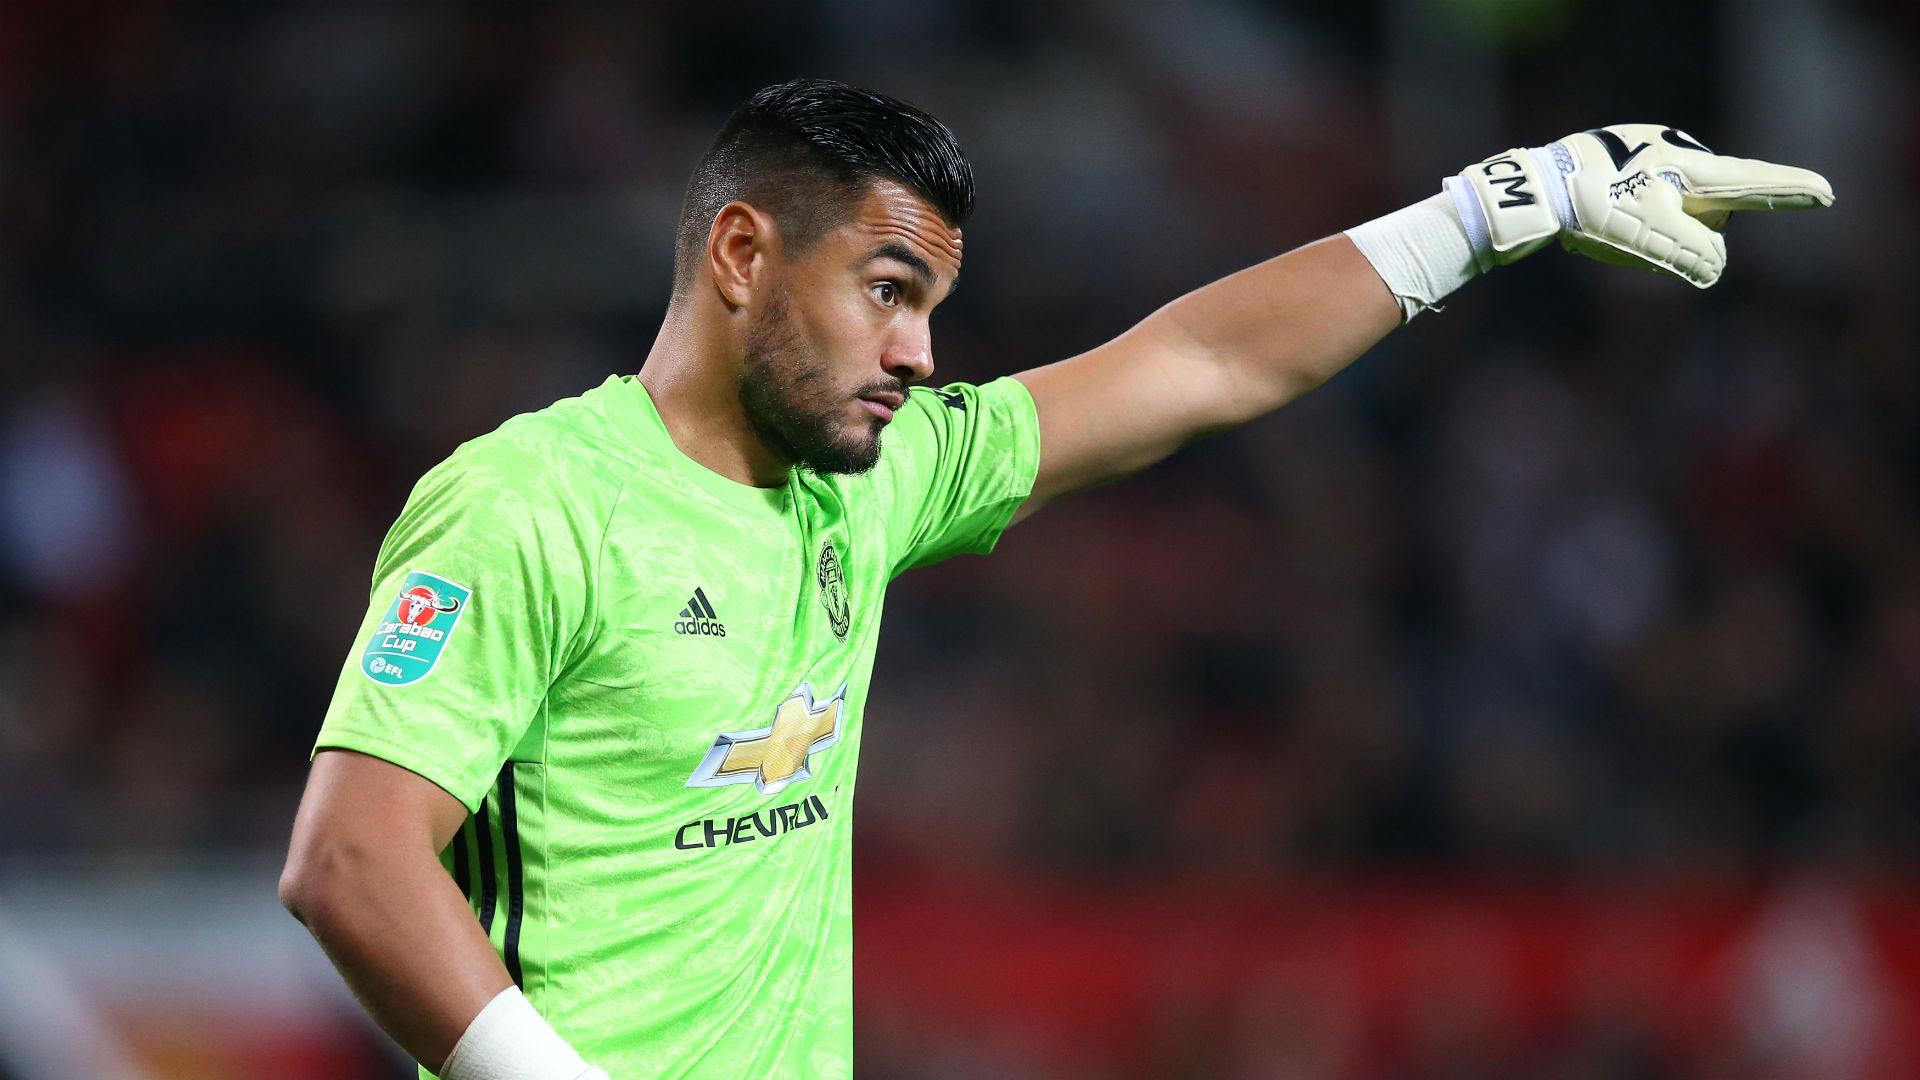 Man Utd goalkeeper Romero unharmed in car crash